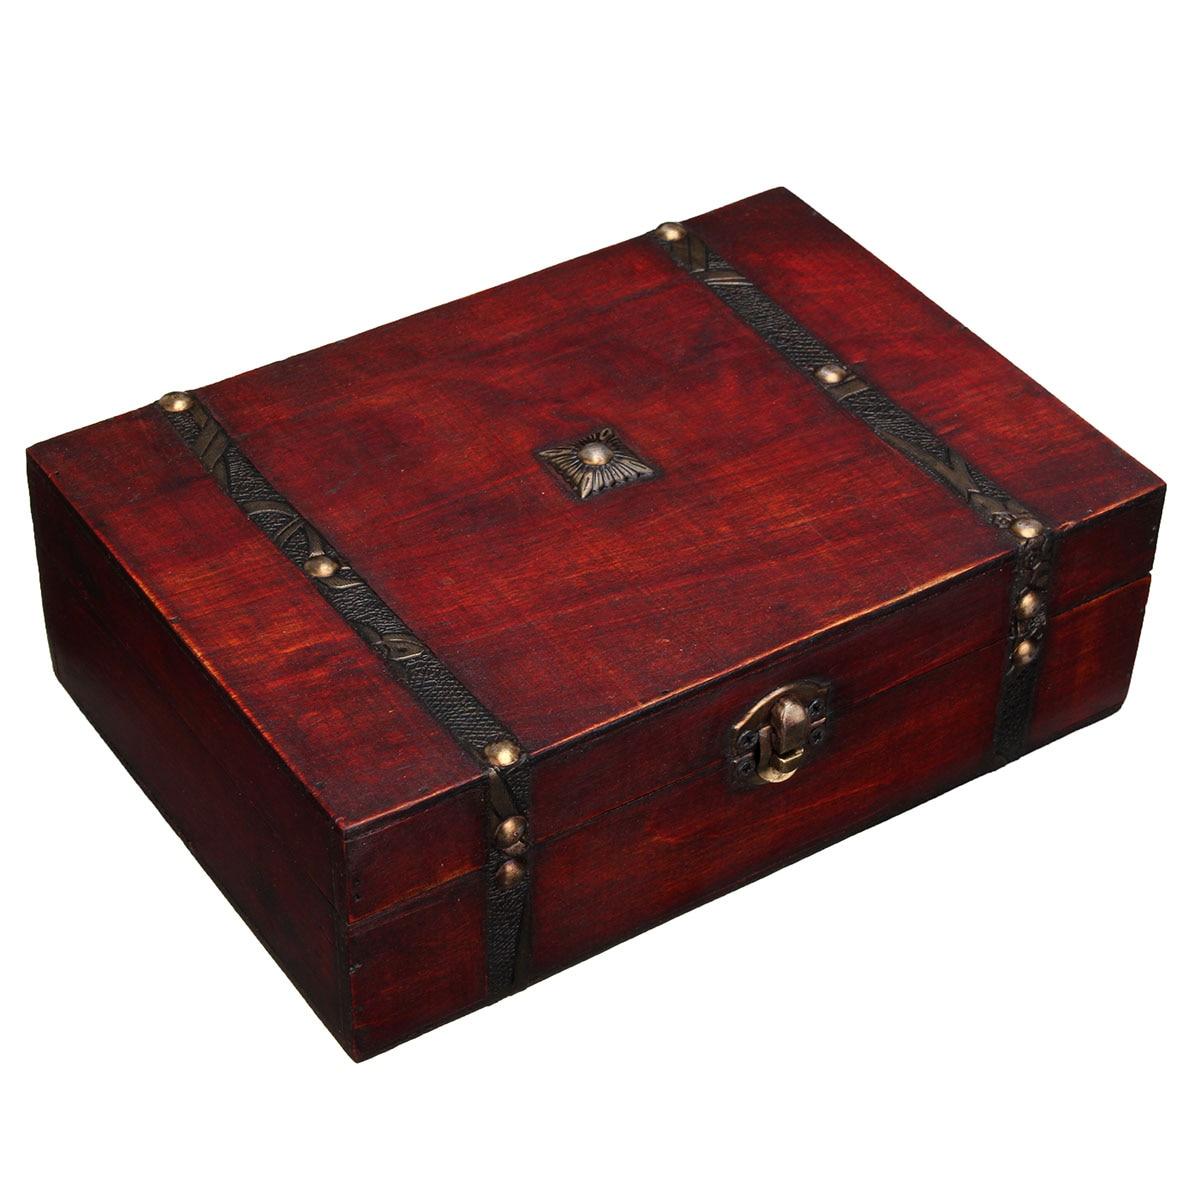 Decorative Display Cases Popular Decorative Display Case Buy Cheap Decorative Display Case